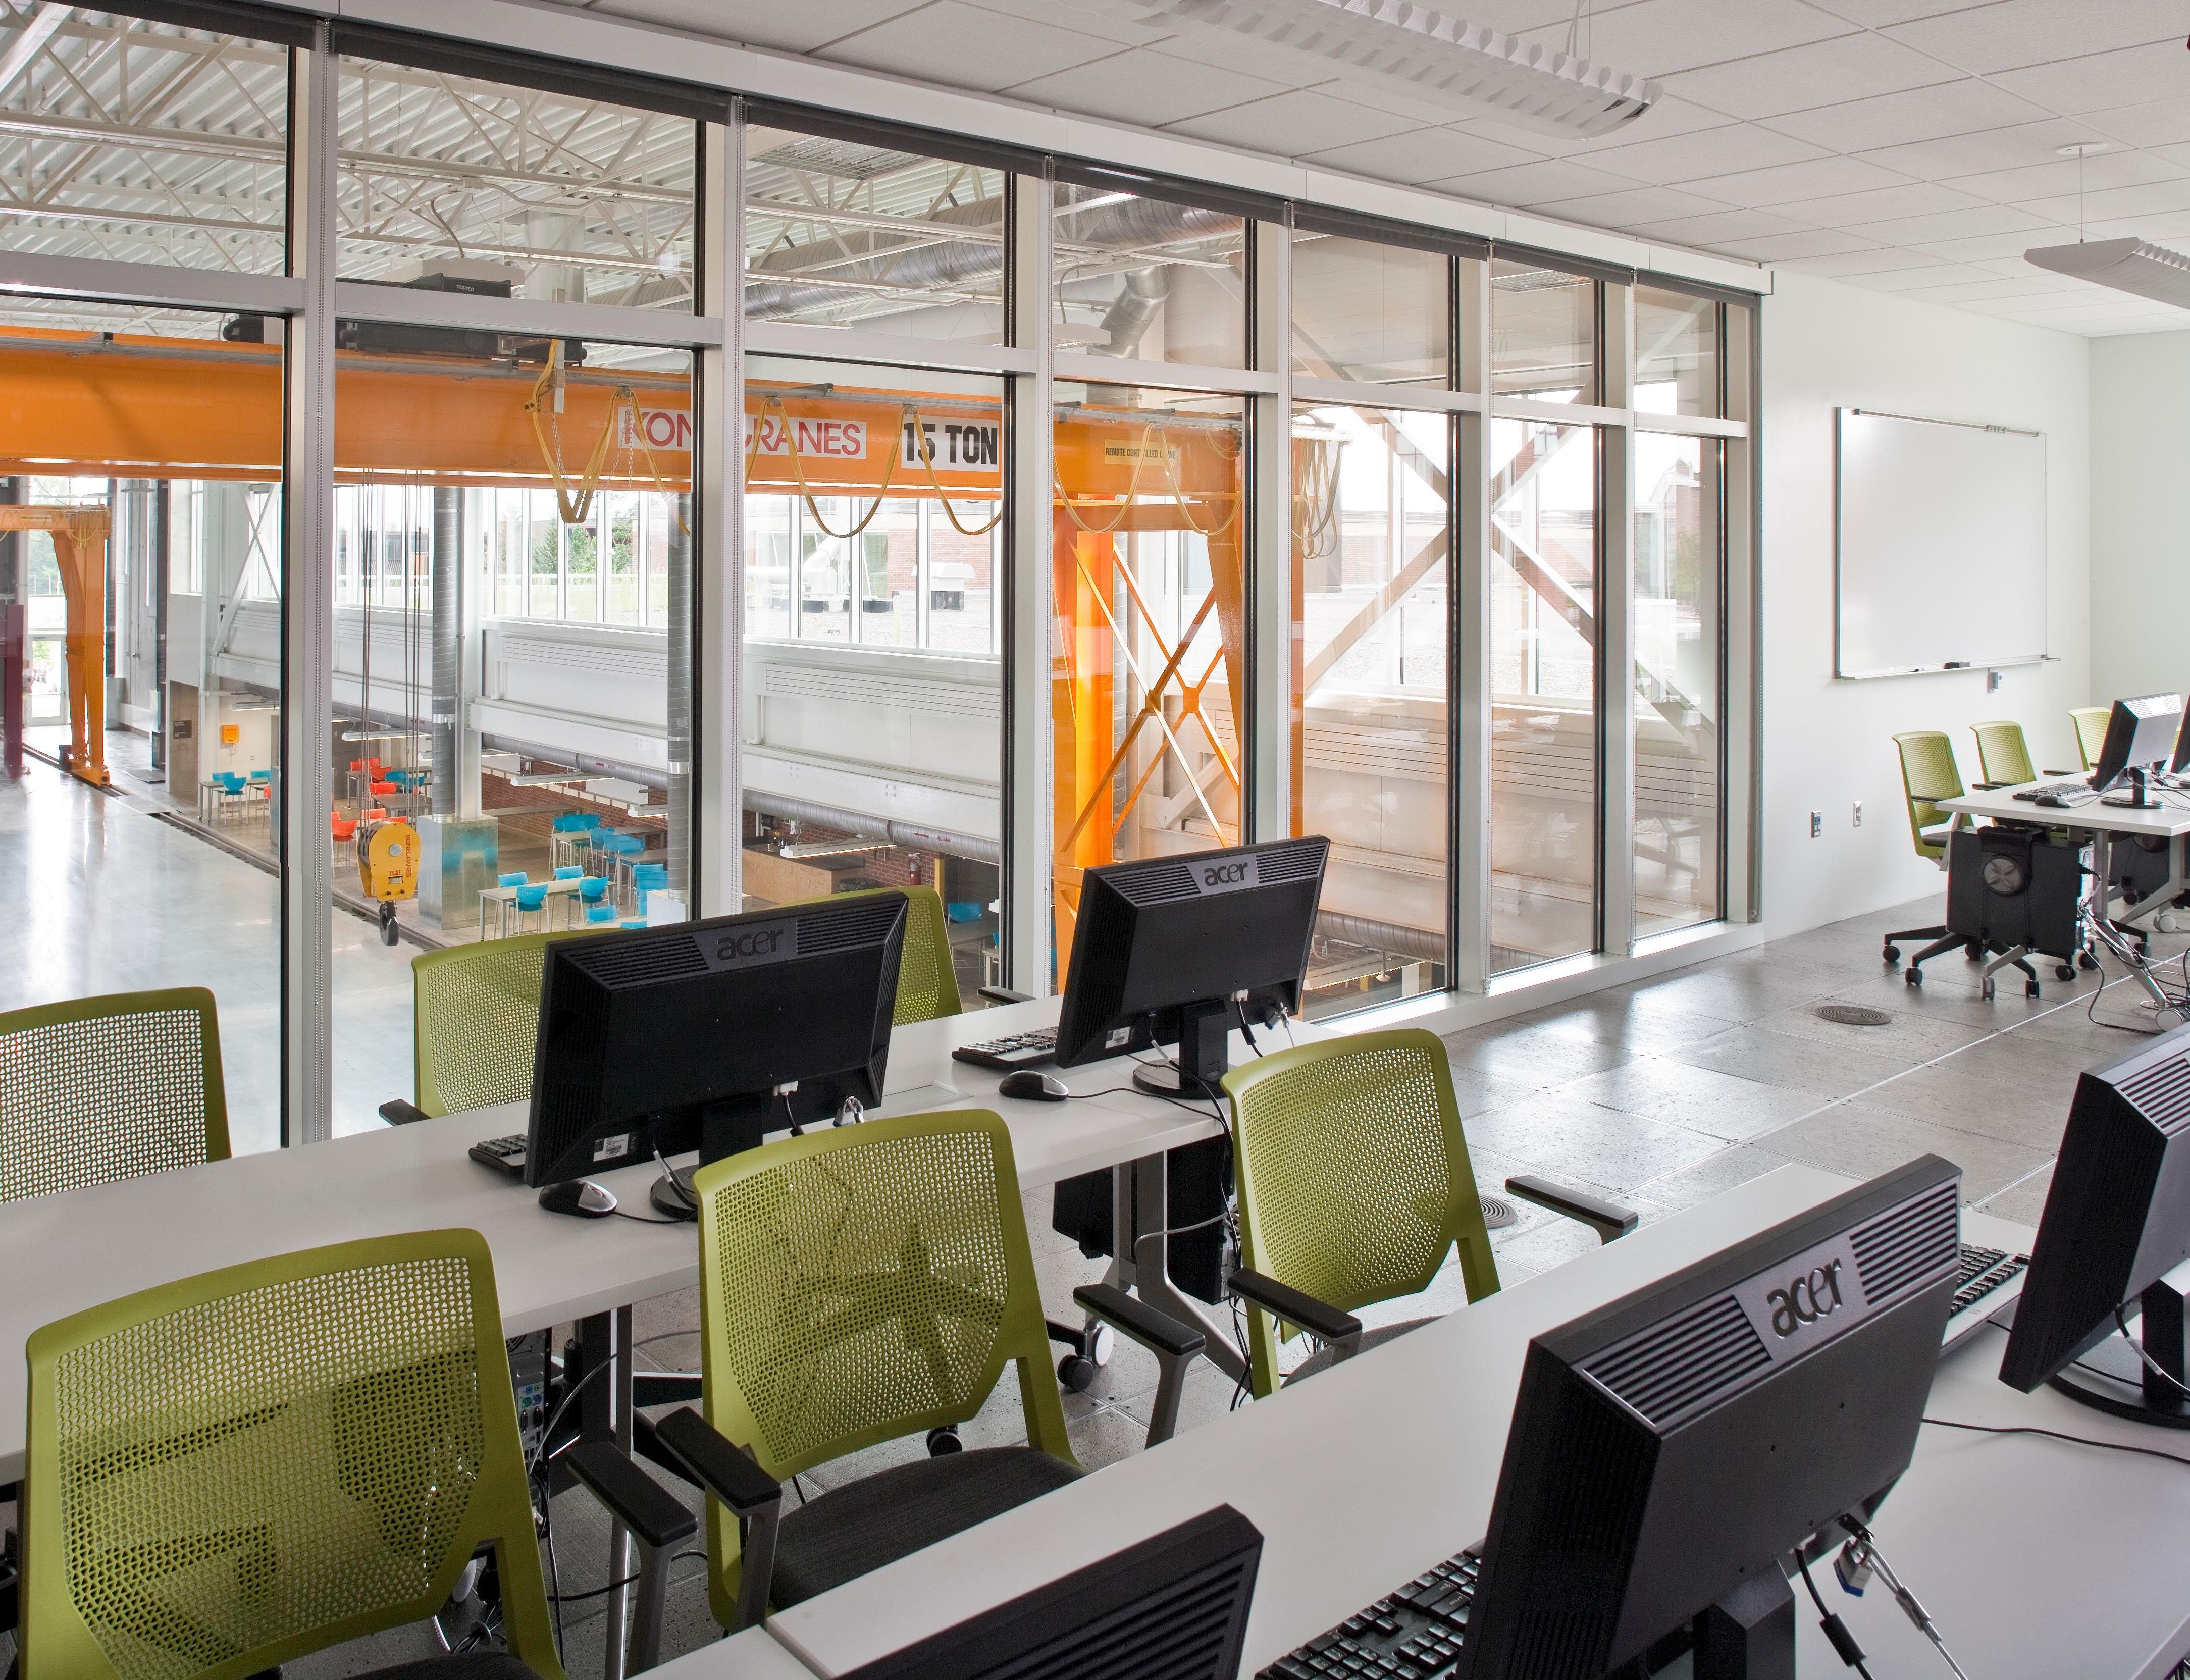 Stahl Construction Umd Swenson Civil Engineering Building Classroom Design